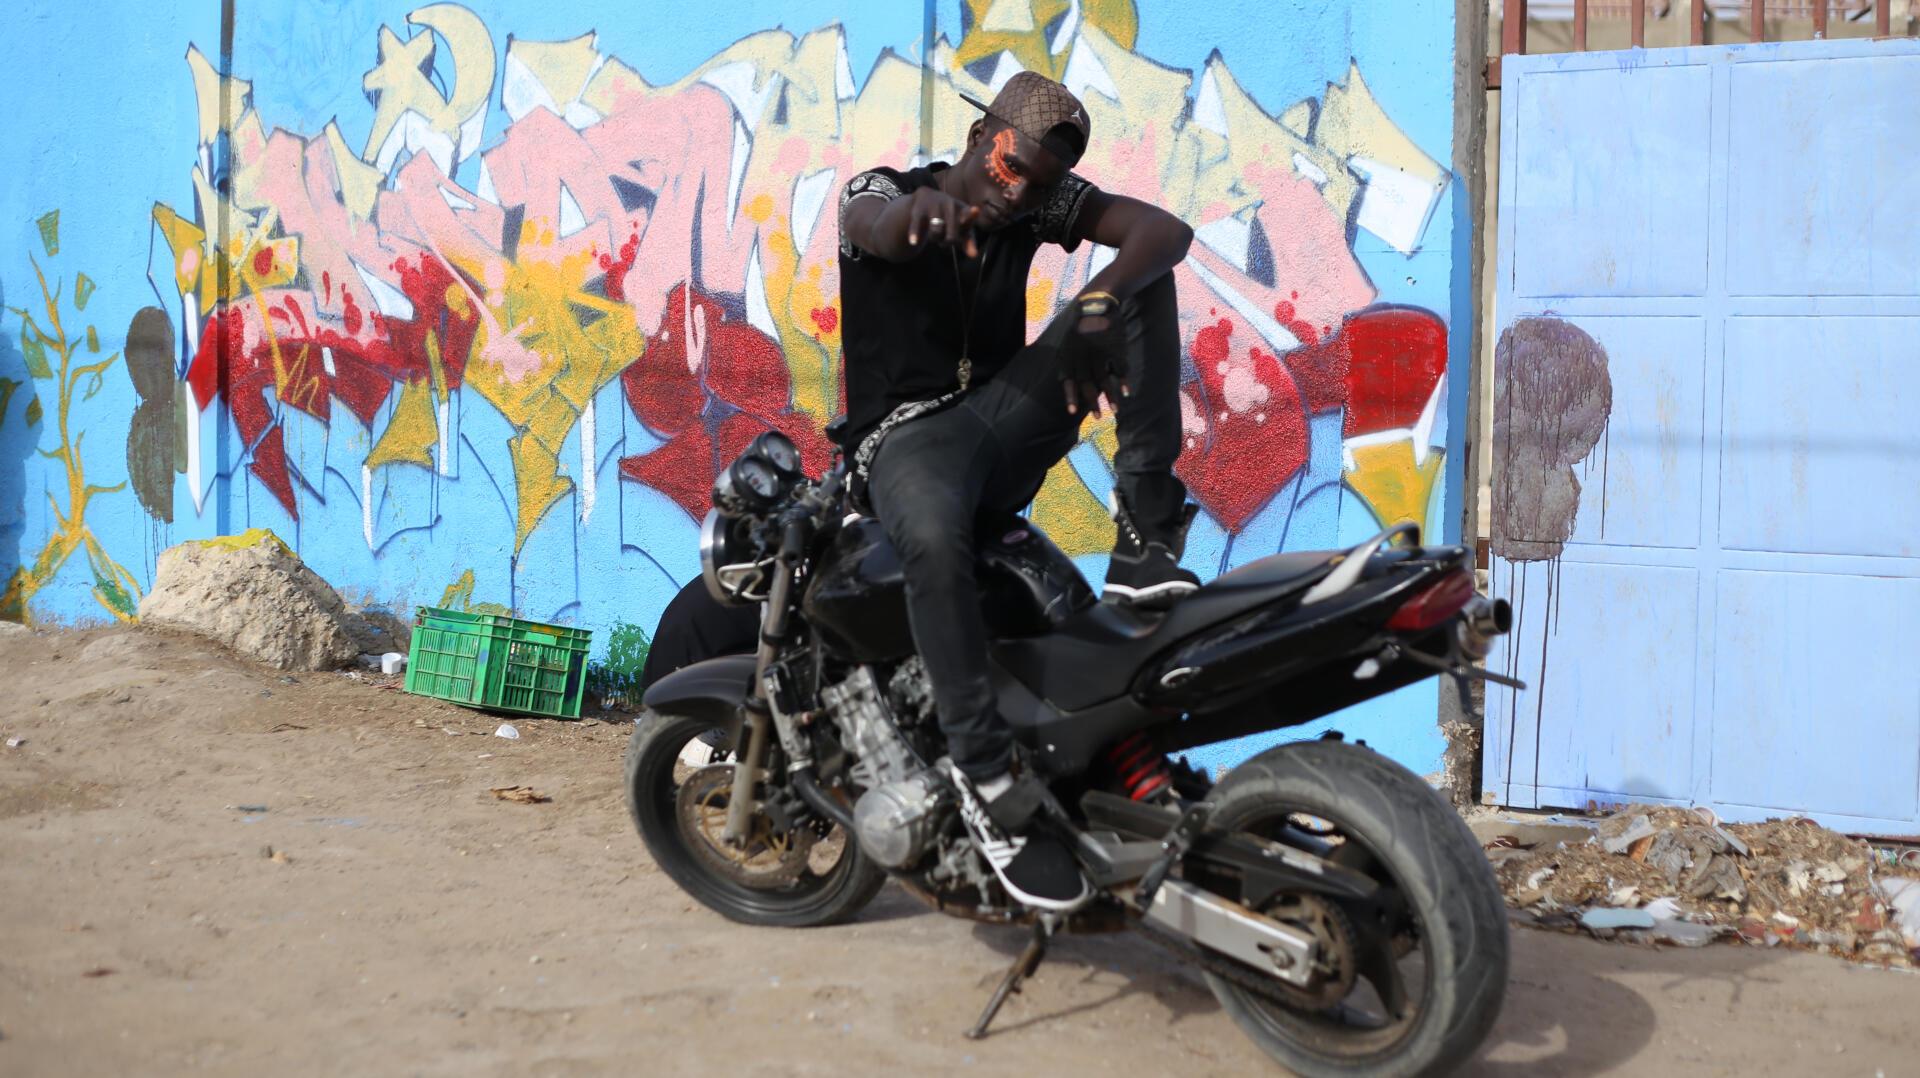 Vidéo Graffiti Sénégal – Set Ci Diamuu Yallah La Bokk